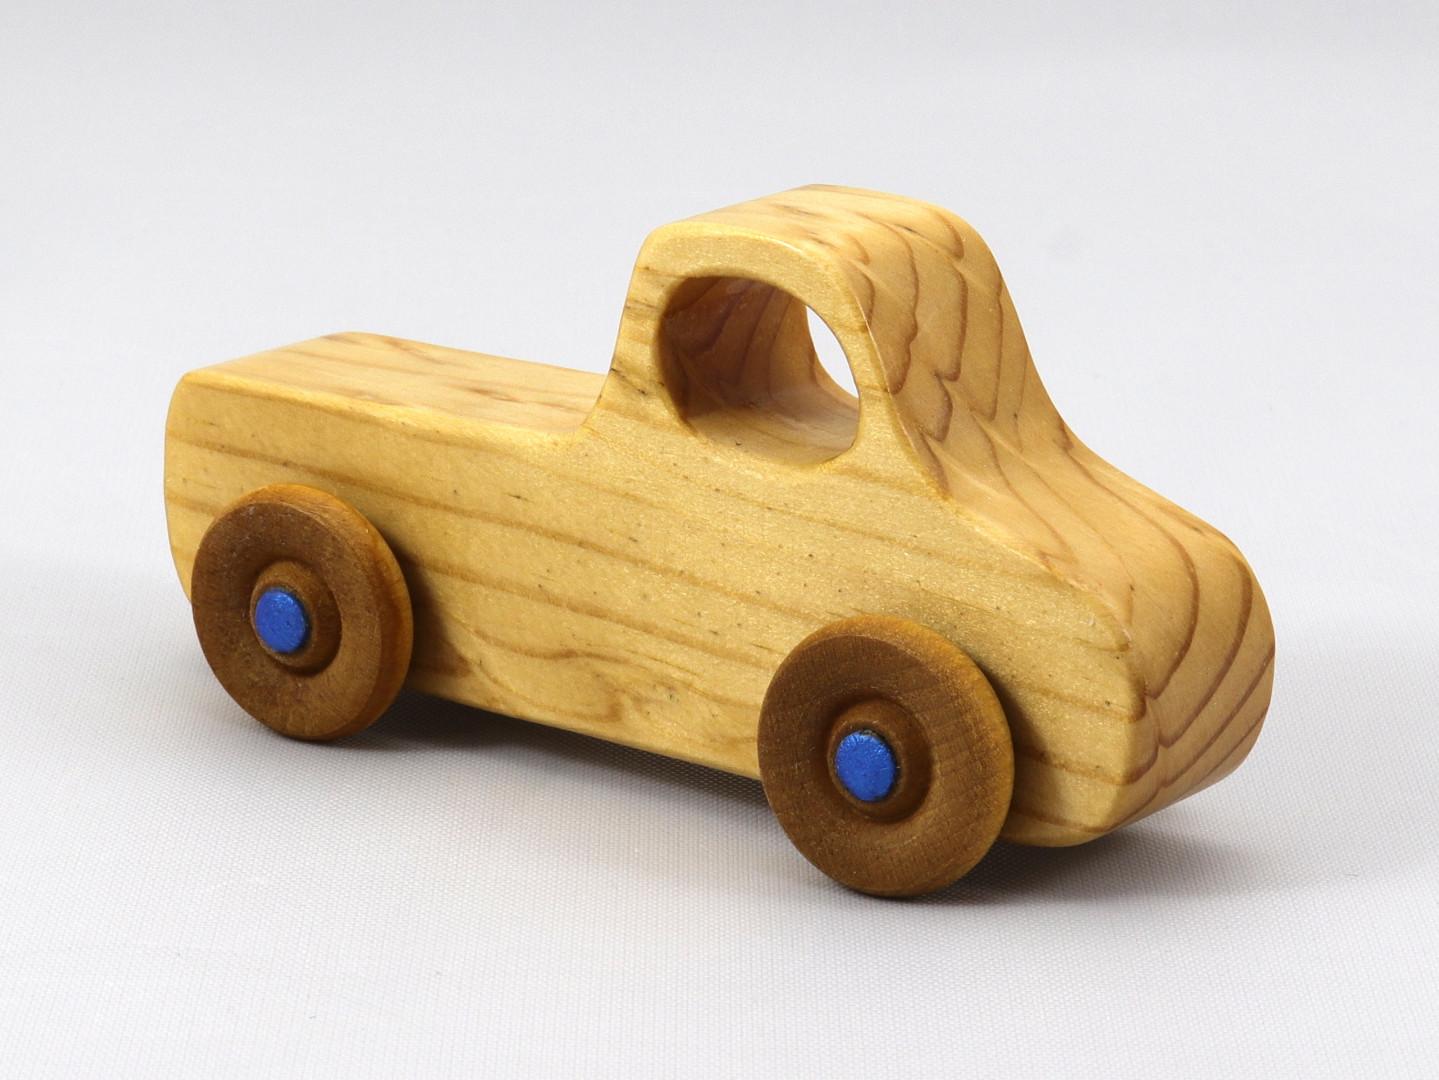 20200105-122043 023 Handmade Wooden Toy Truck Play Pal Pickup Pocket T.jpg